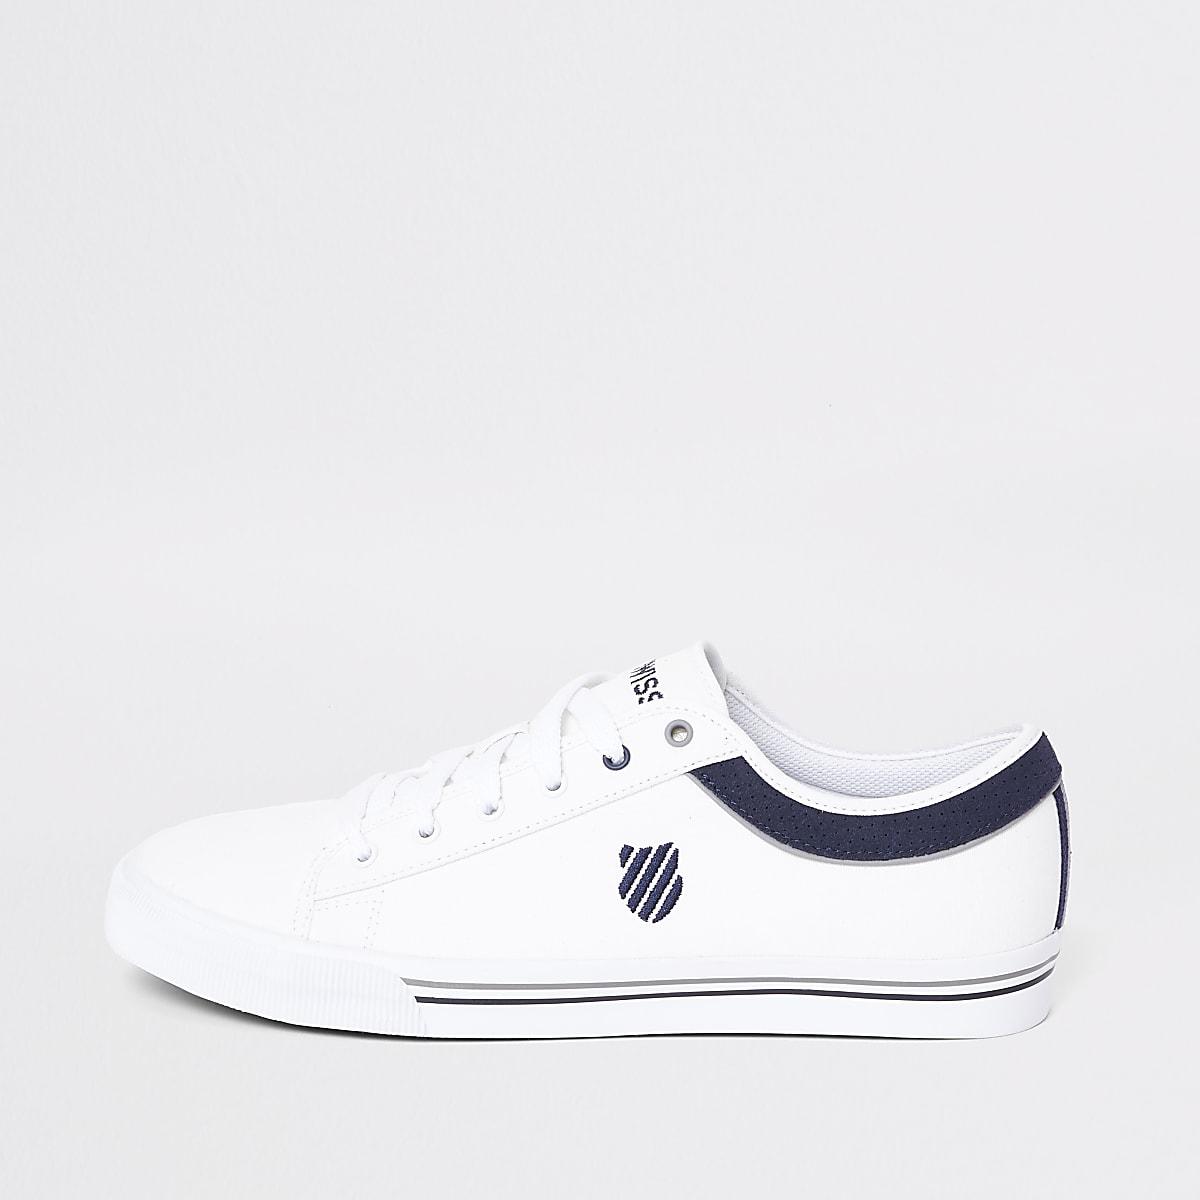 37d228e6336 K-Swiss Bridgeport - Witte sneakers - Sneakers - Schoenen & Laarzen ...